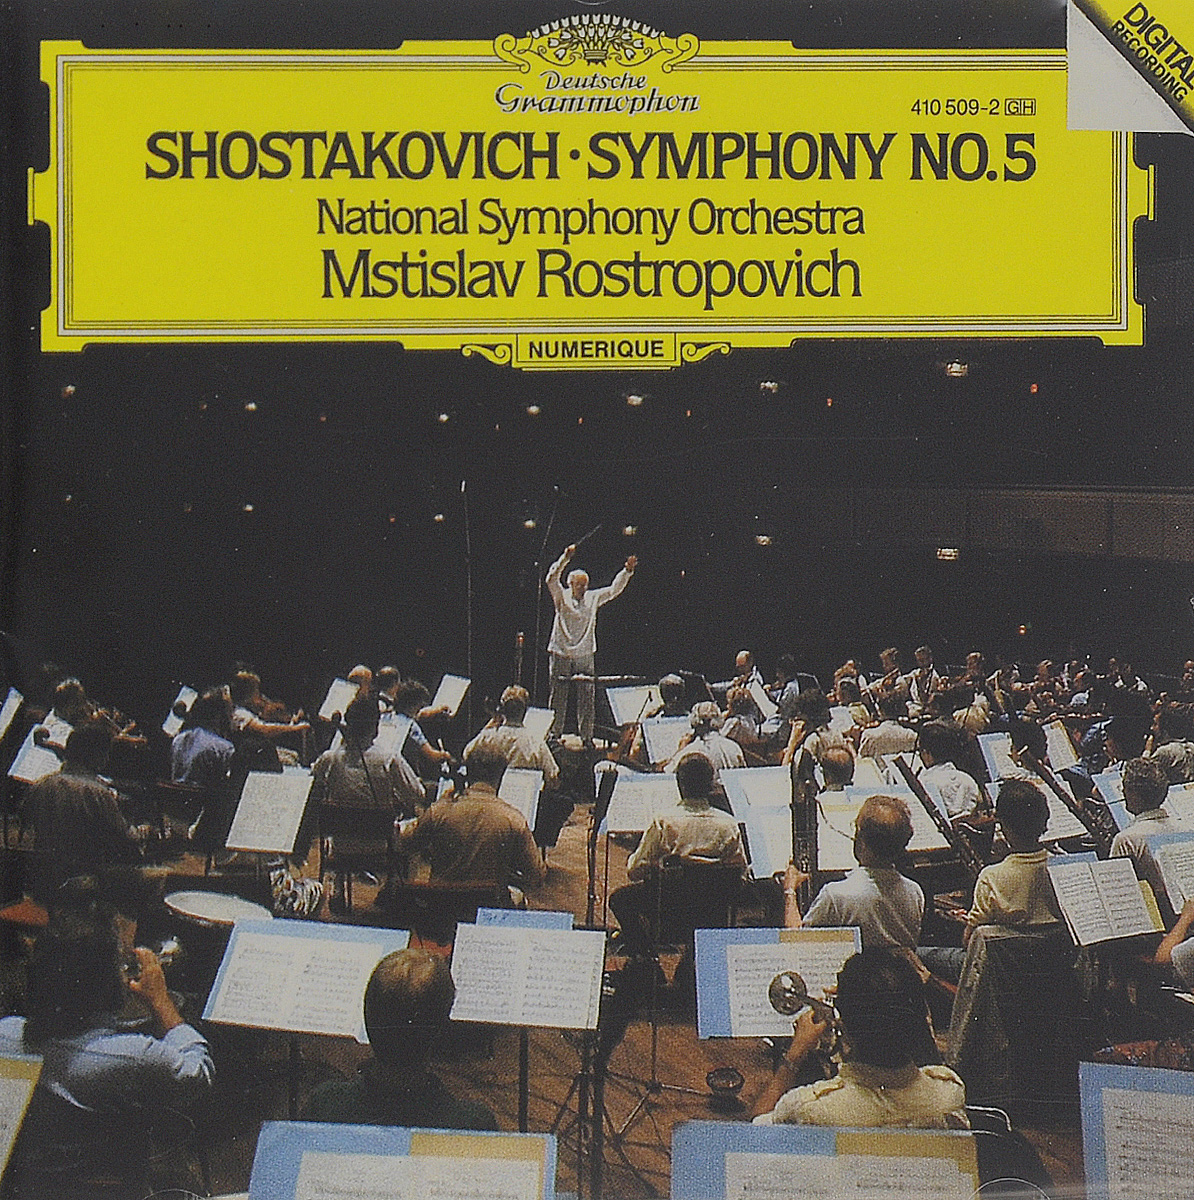 цена на Мстислав Ростропович,National Symphony Orchestra Of Washington Mstislav Rostropovich. Shostakovich. Symphony No. 5